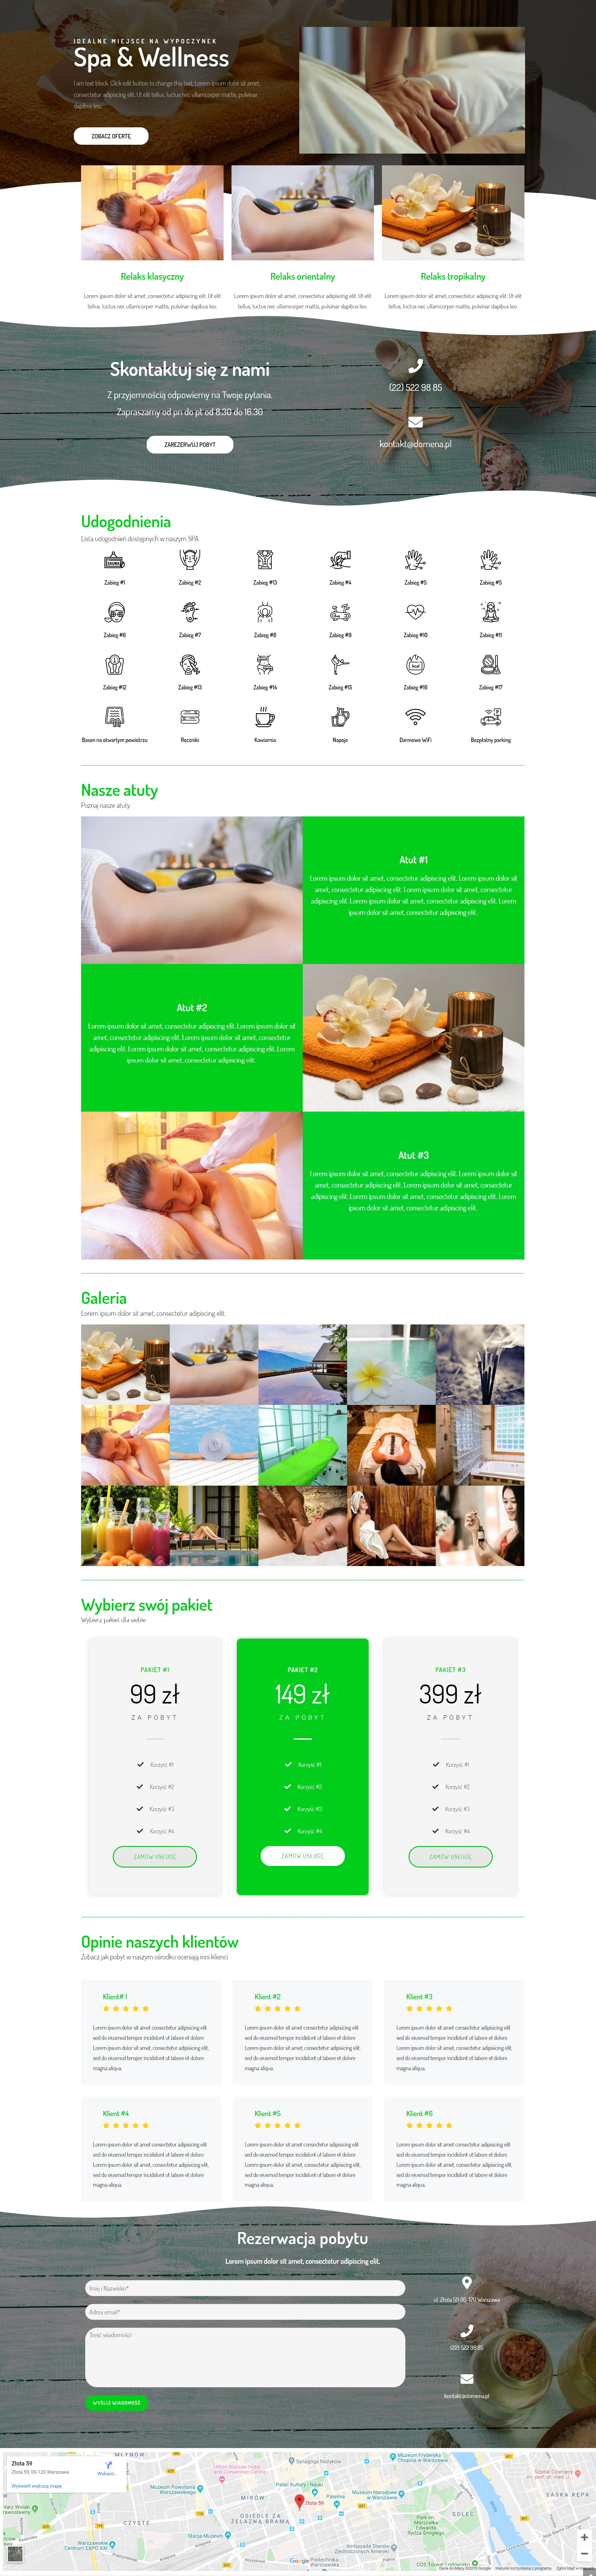 spa01 screen - SPA01 - szablon do wtyczki Elementor